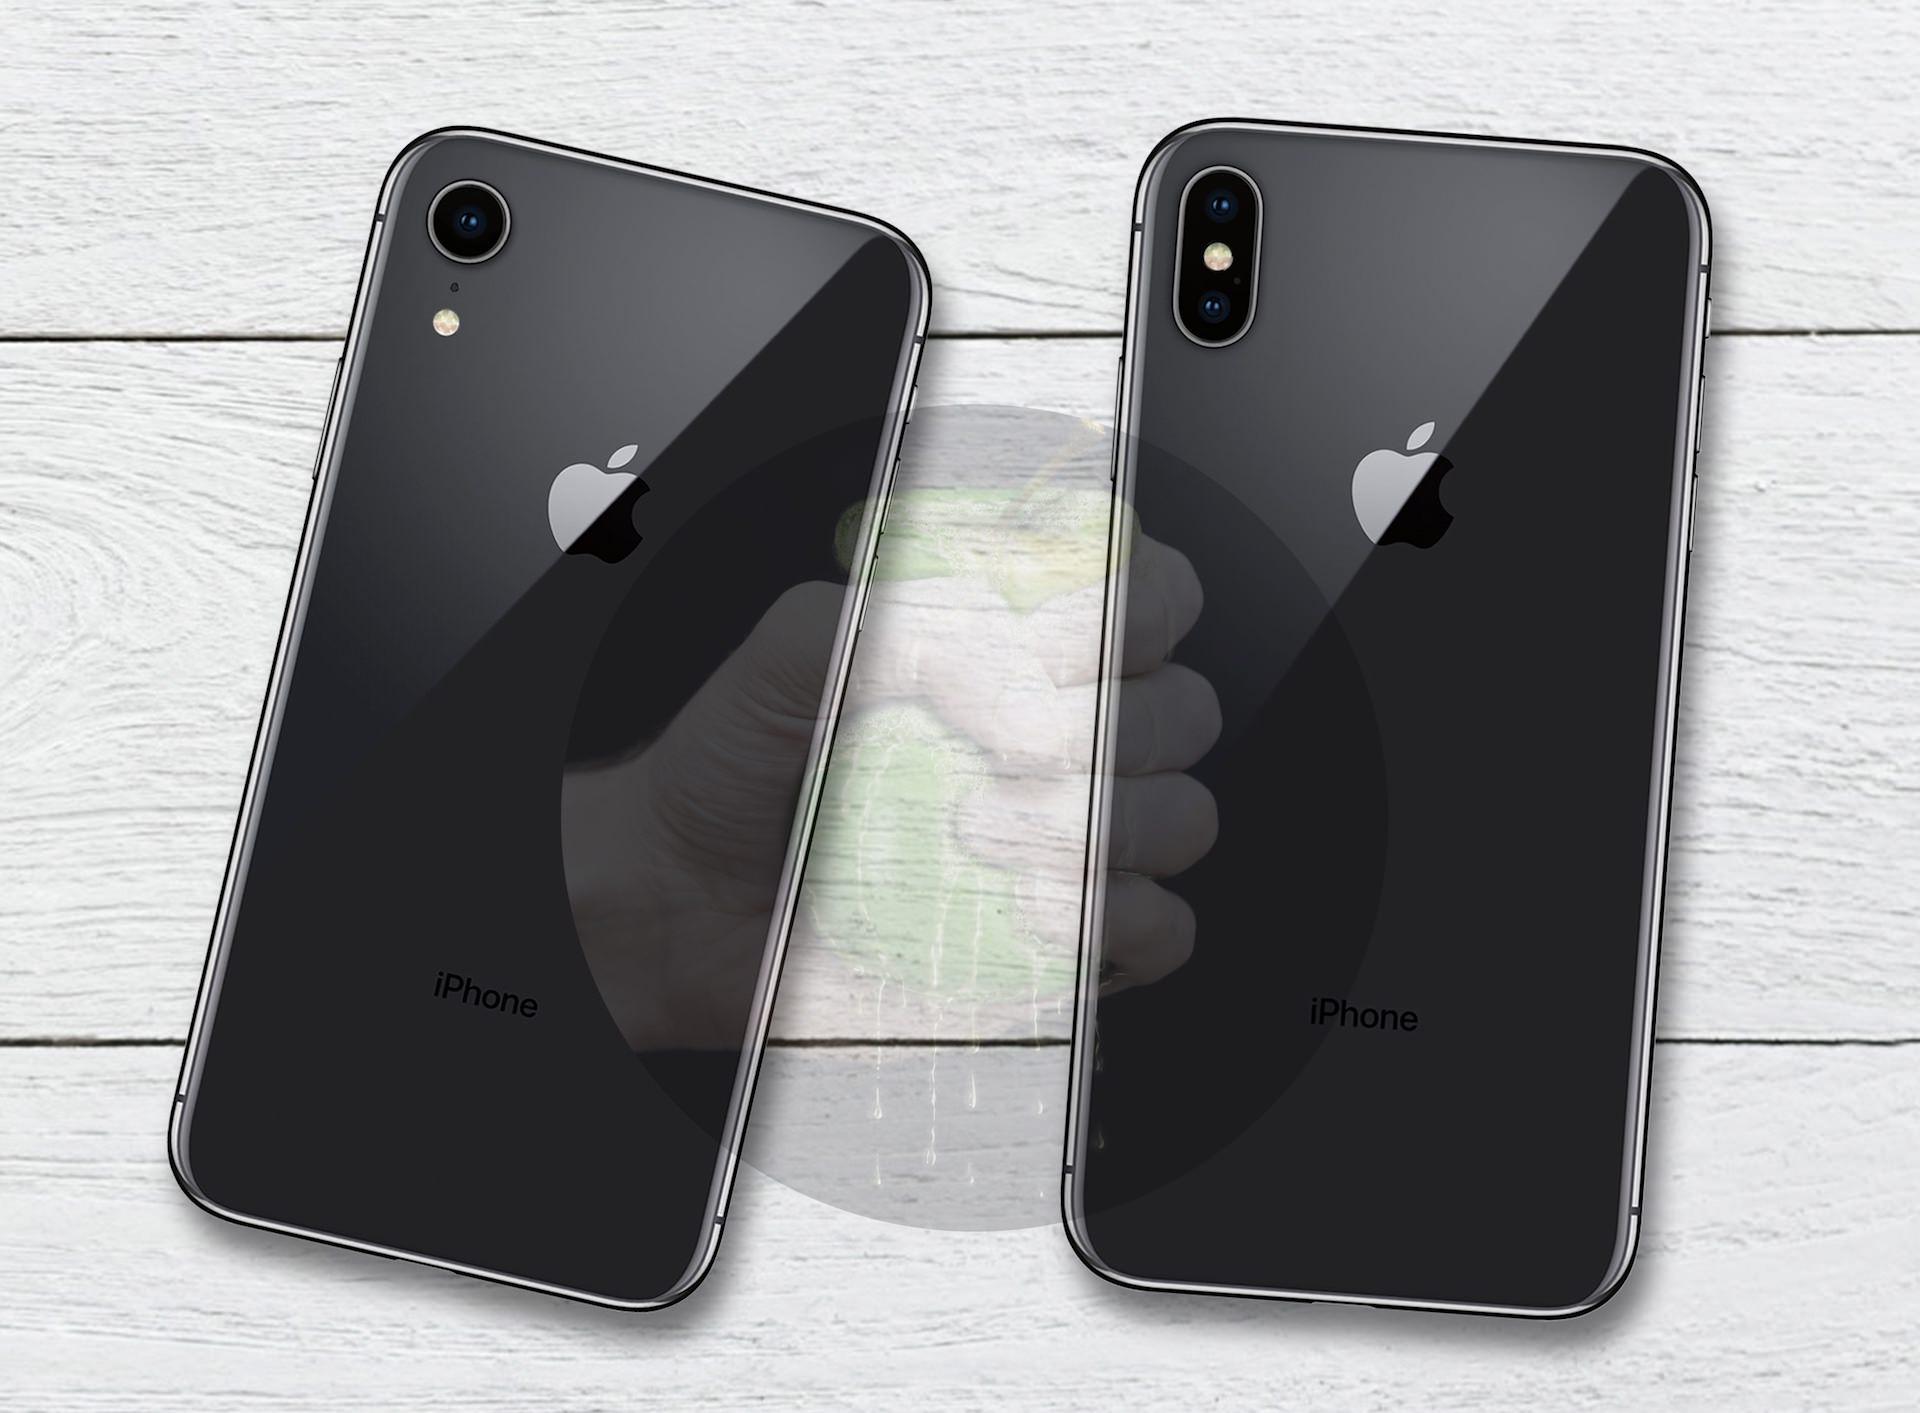 iPhone-9-wylsacom-8.jpg